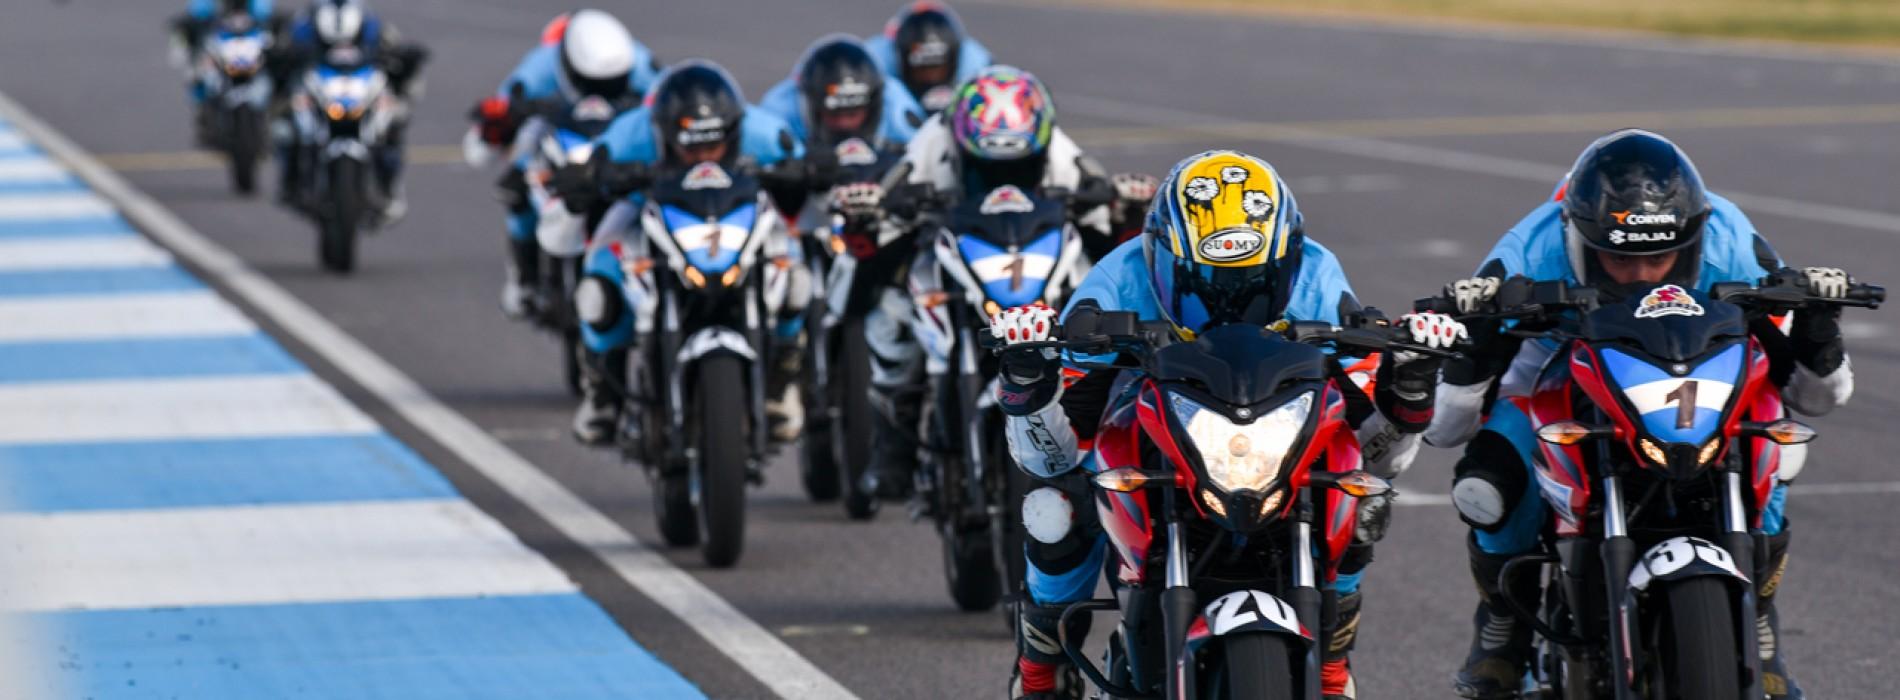 Argentina-Race-Scool-15-motoclick-1900x700_c